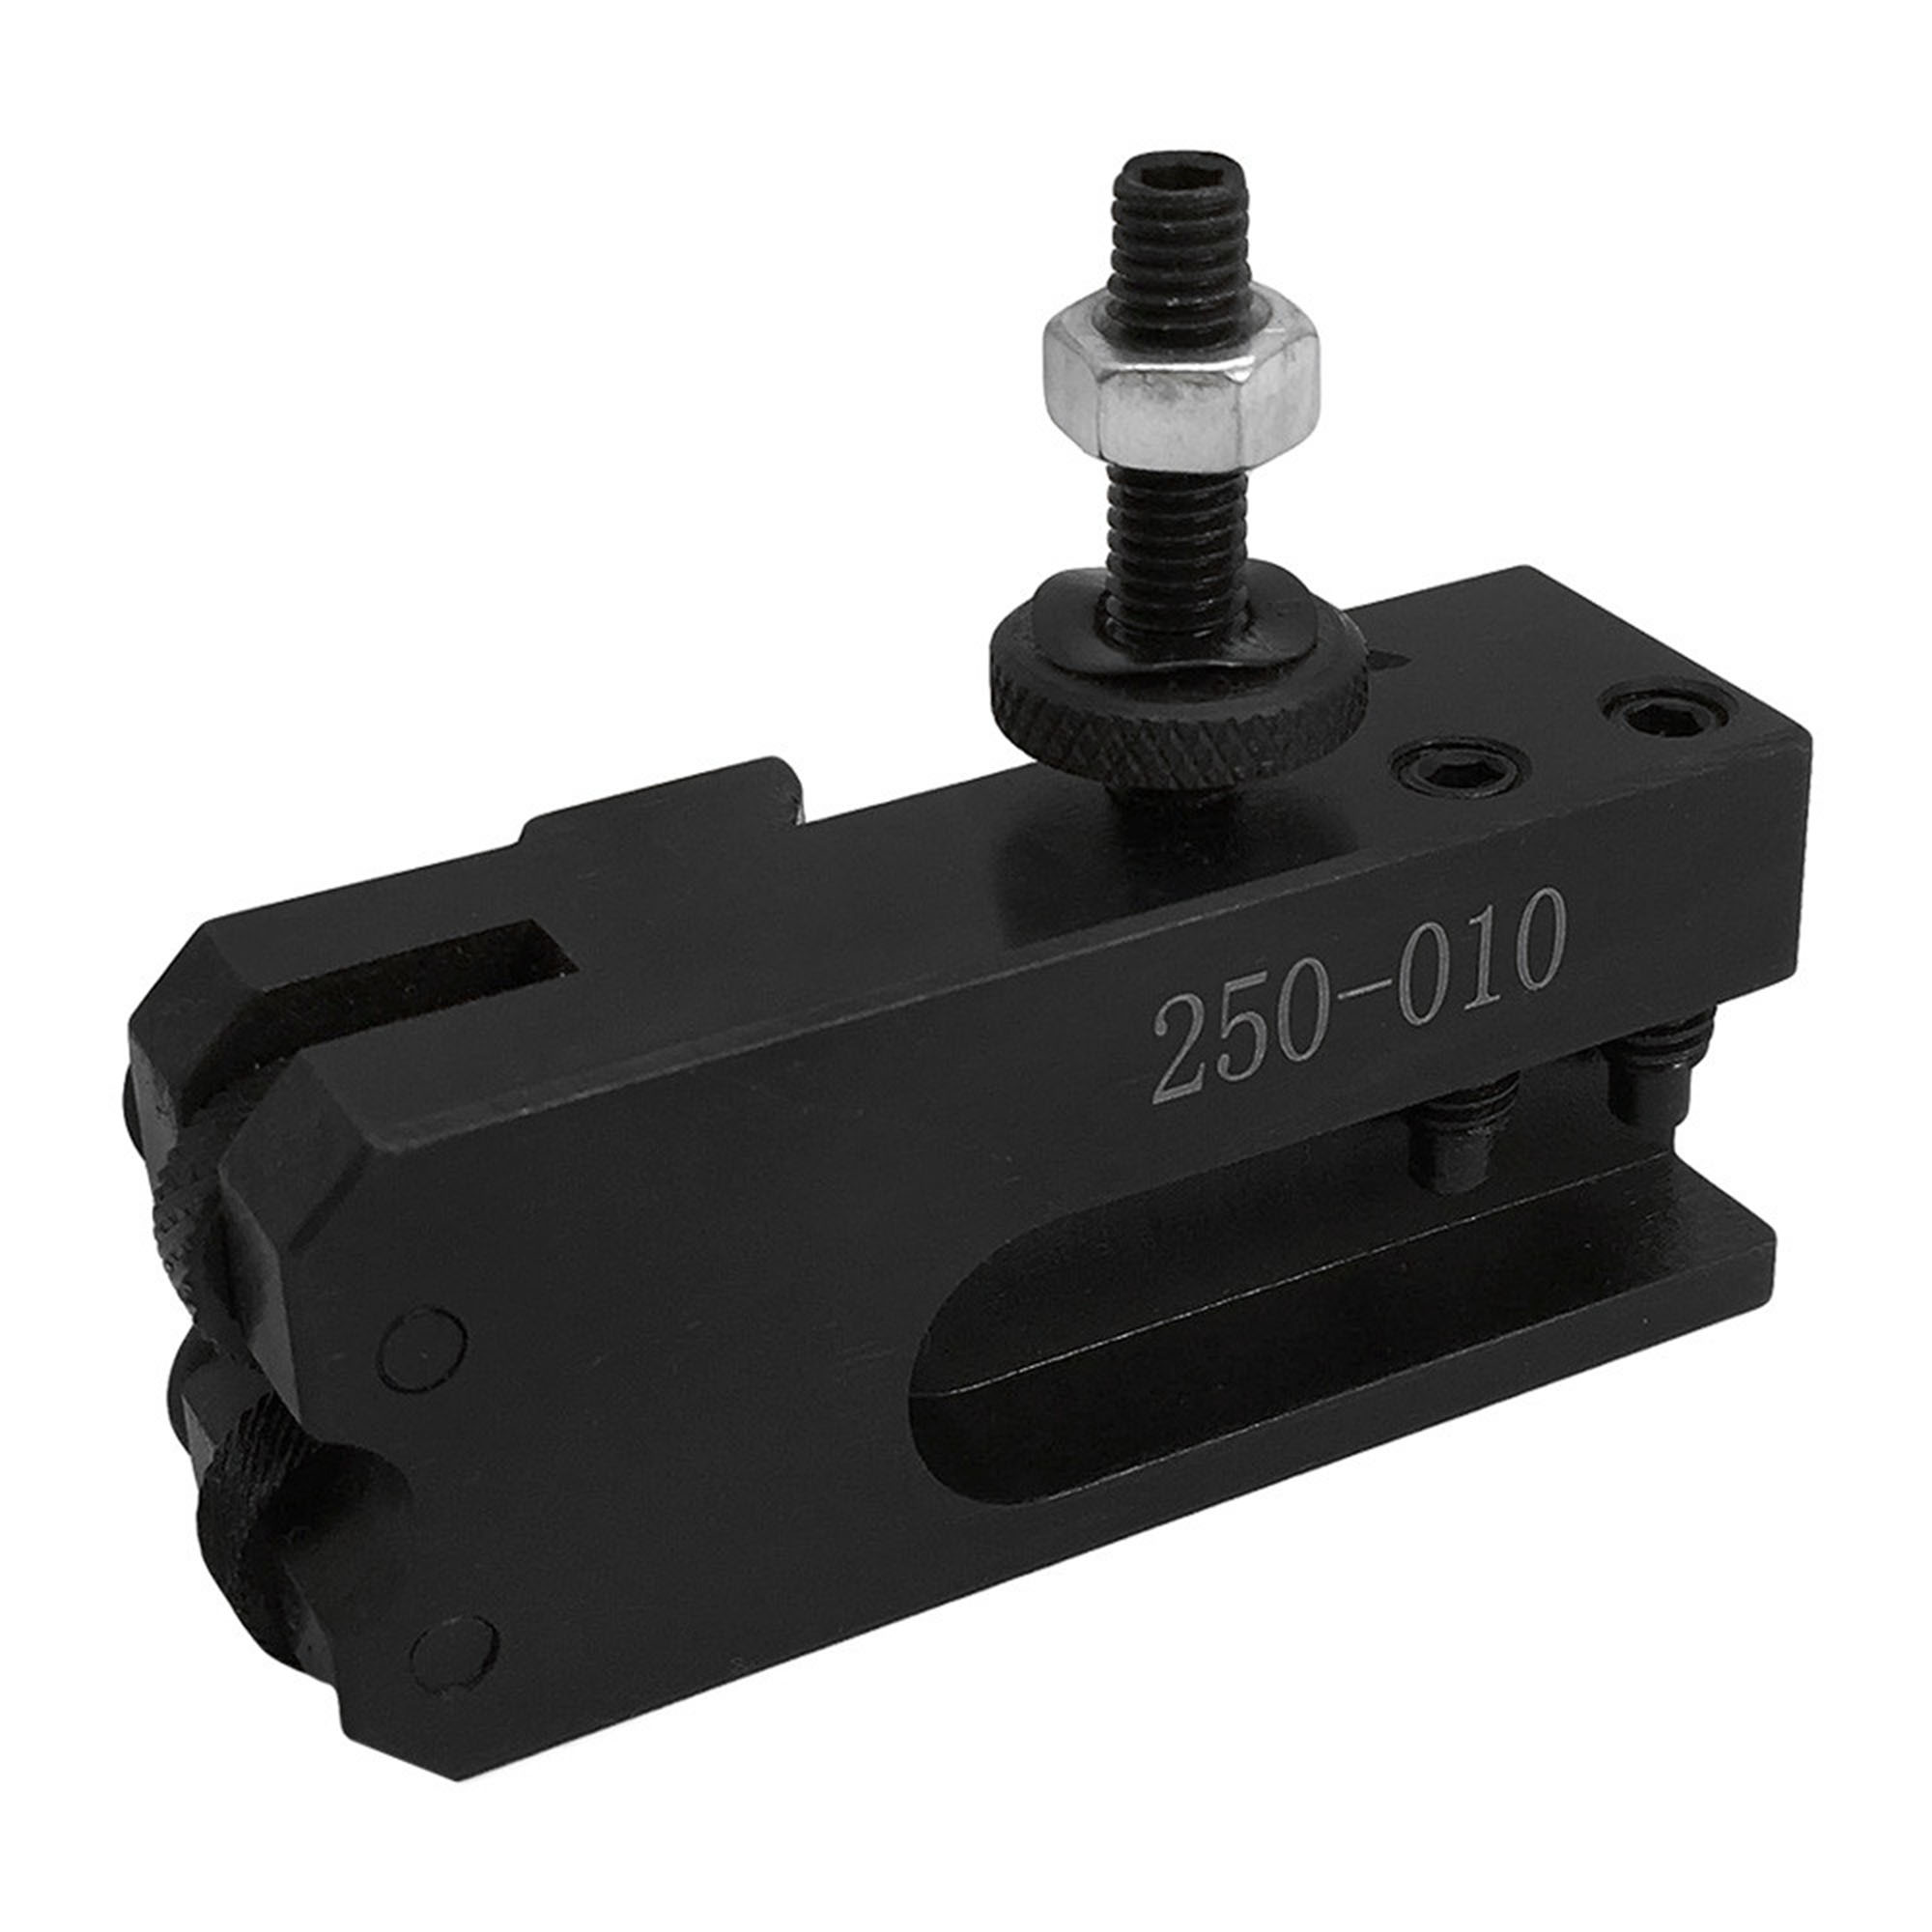 #10 OXA Knurling Turning Facing Holder Quick Change CNC Lathe Tool Post 250-010